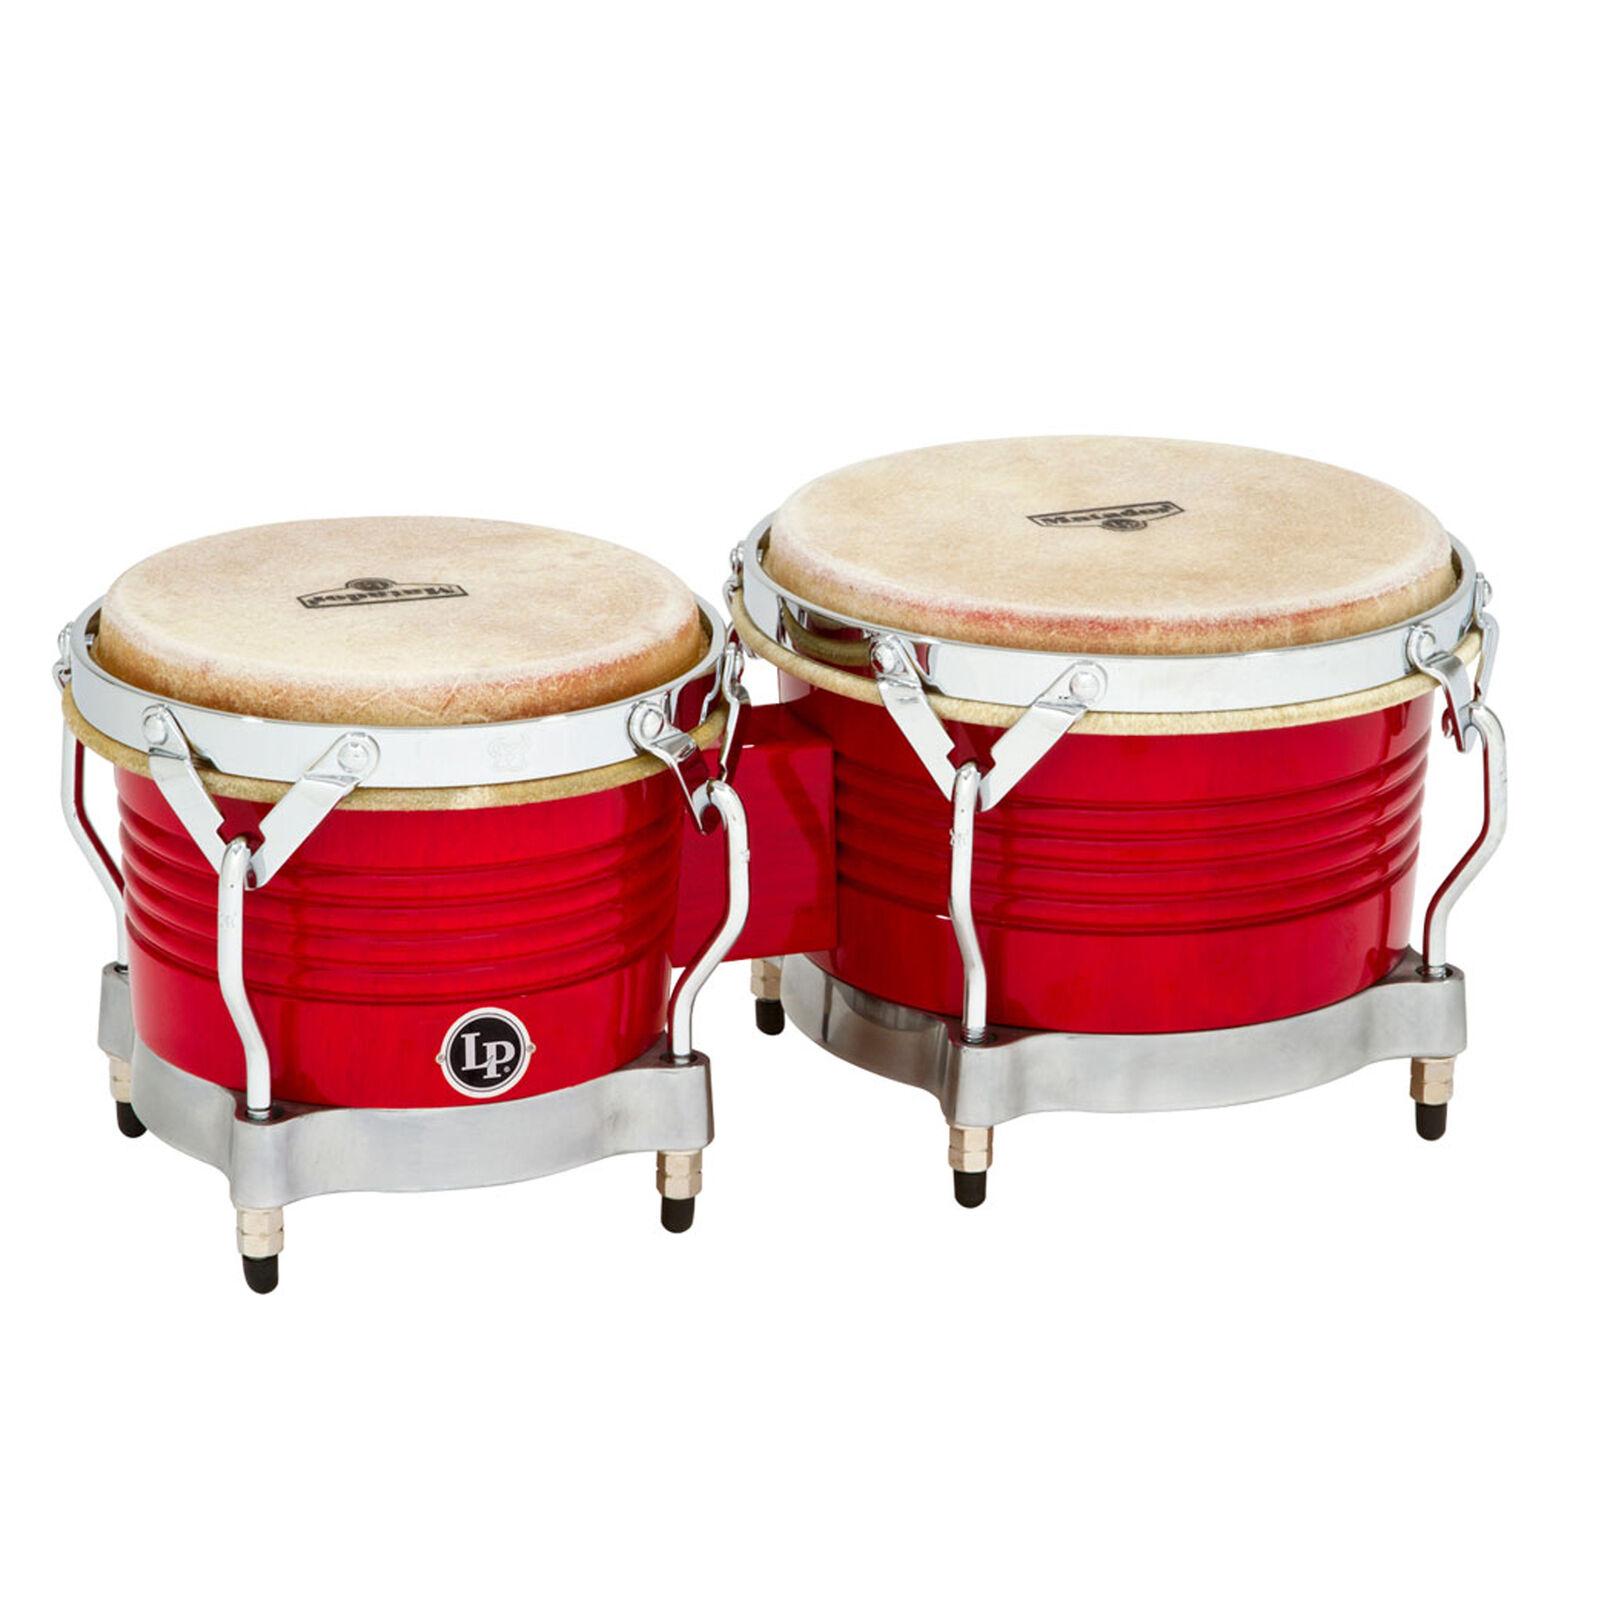 Latin Percussion LP Matador Wood Bongos rot Chrome Hardware